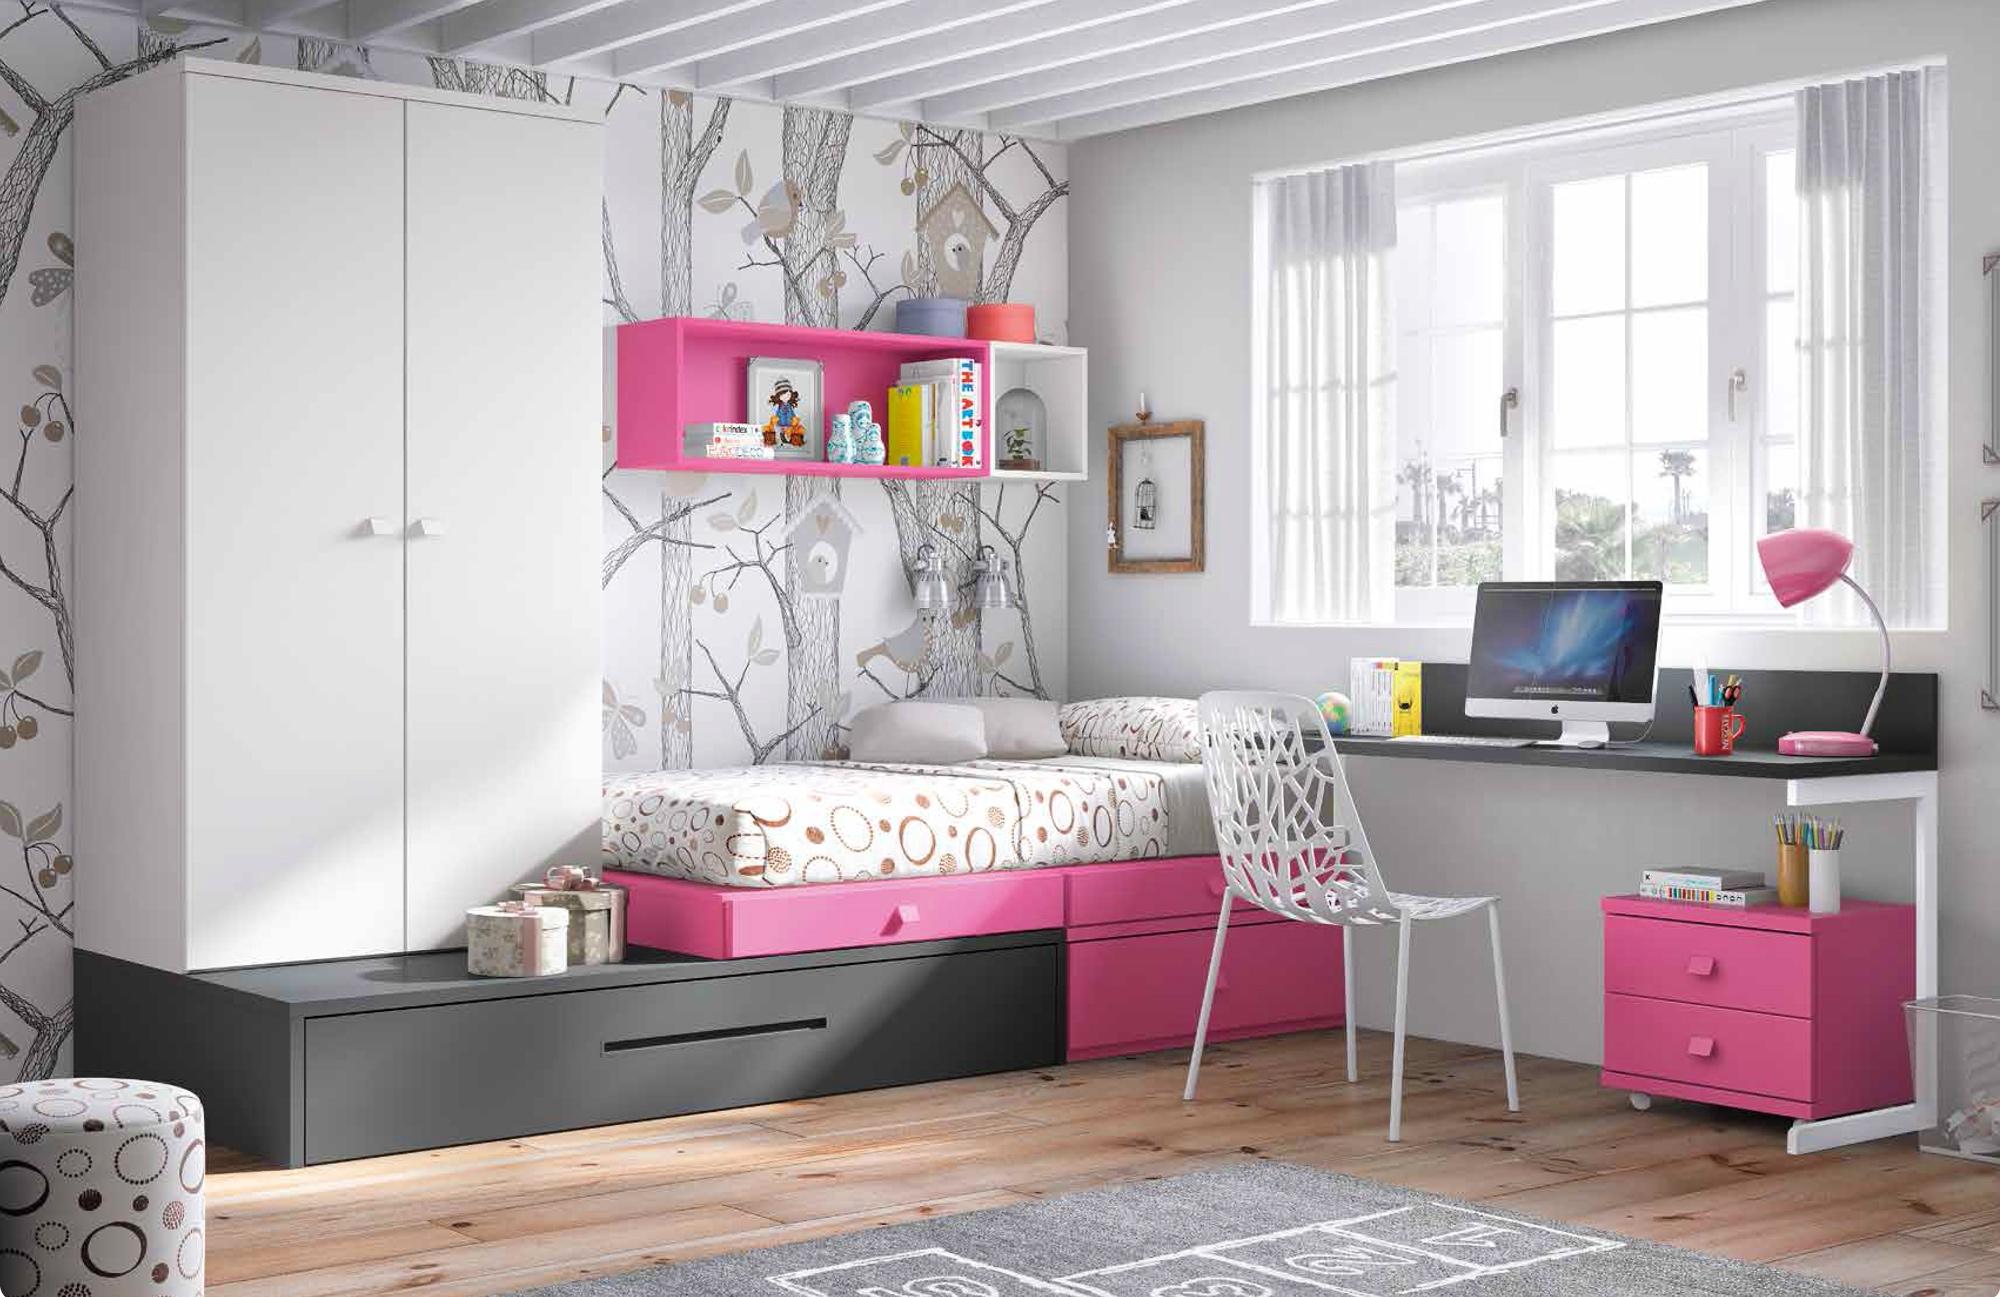 chambre enfant complete personnaliser girly glicerio so nuit. Black Bedroom Furniture Sets. Home Design Ideas